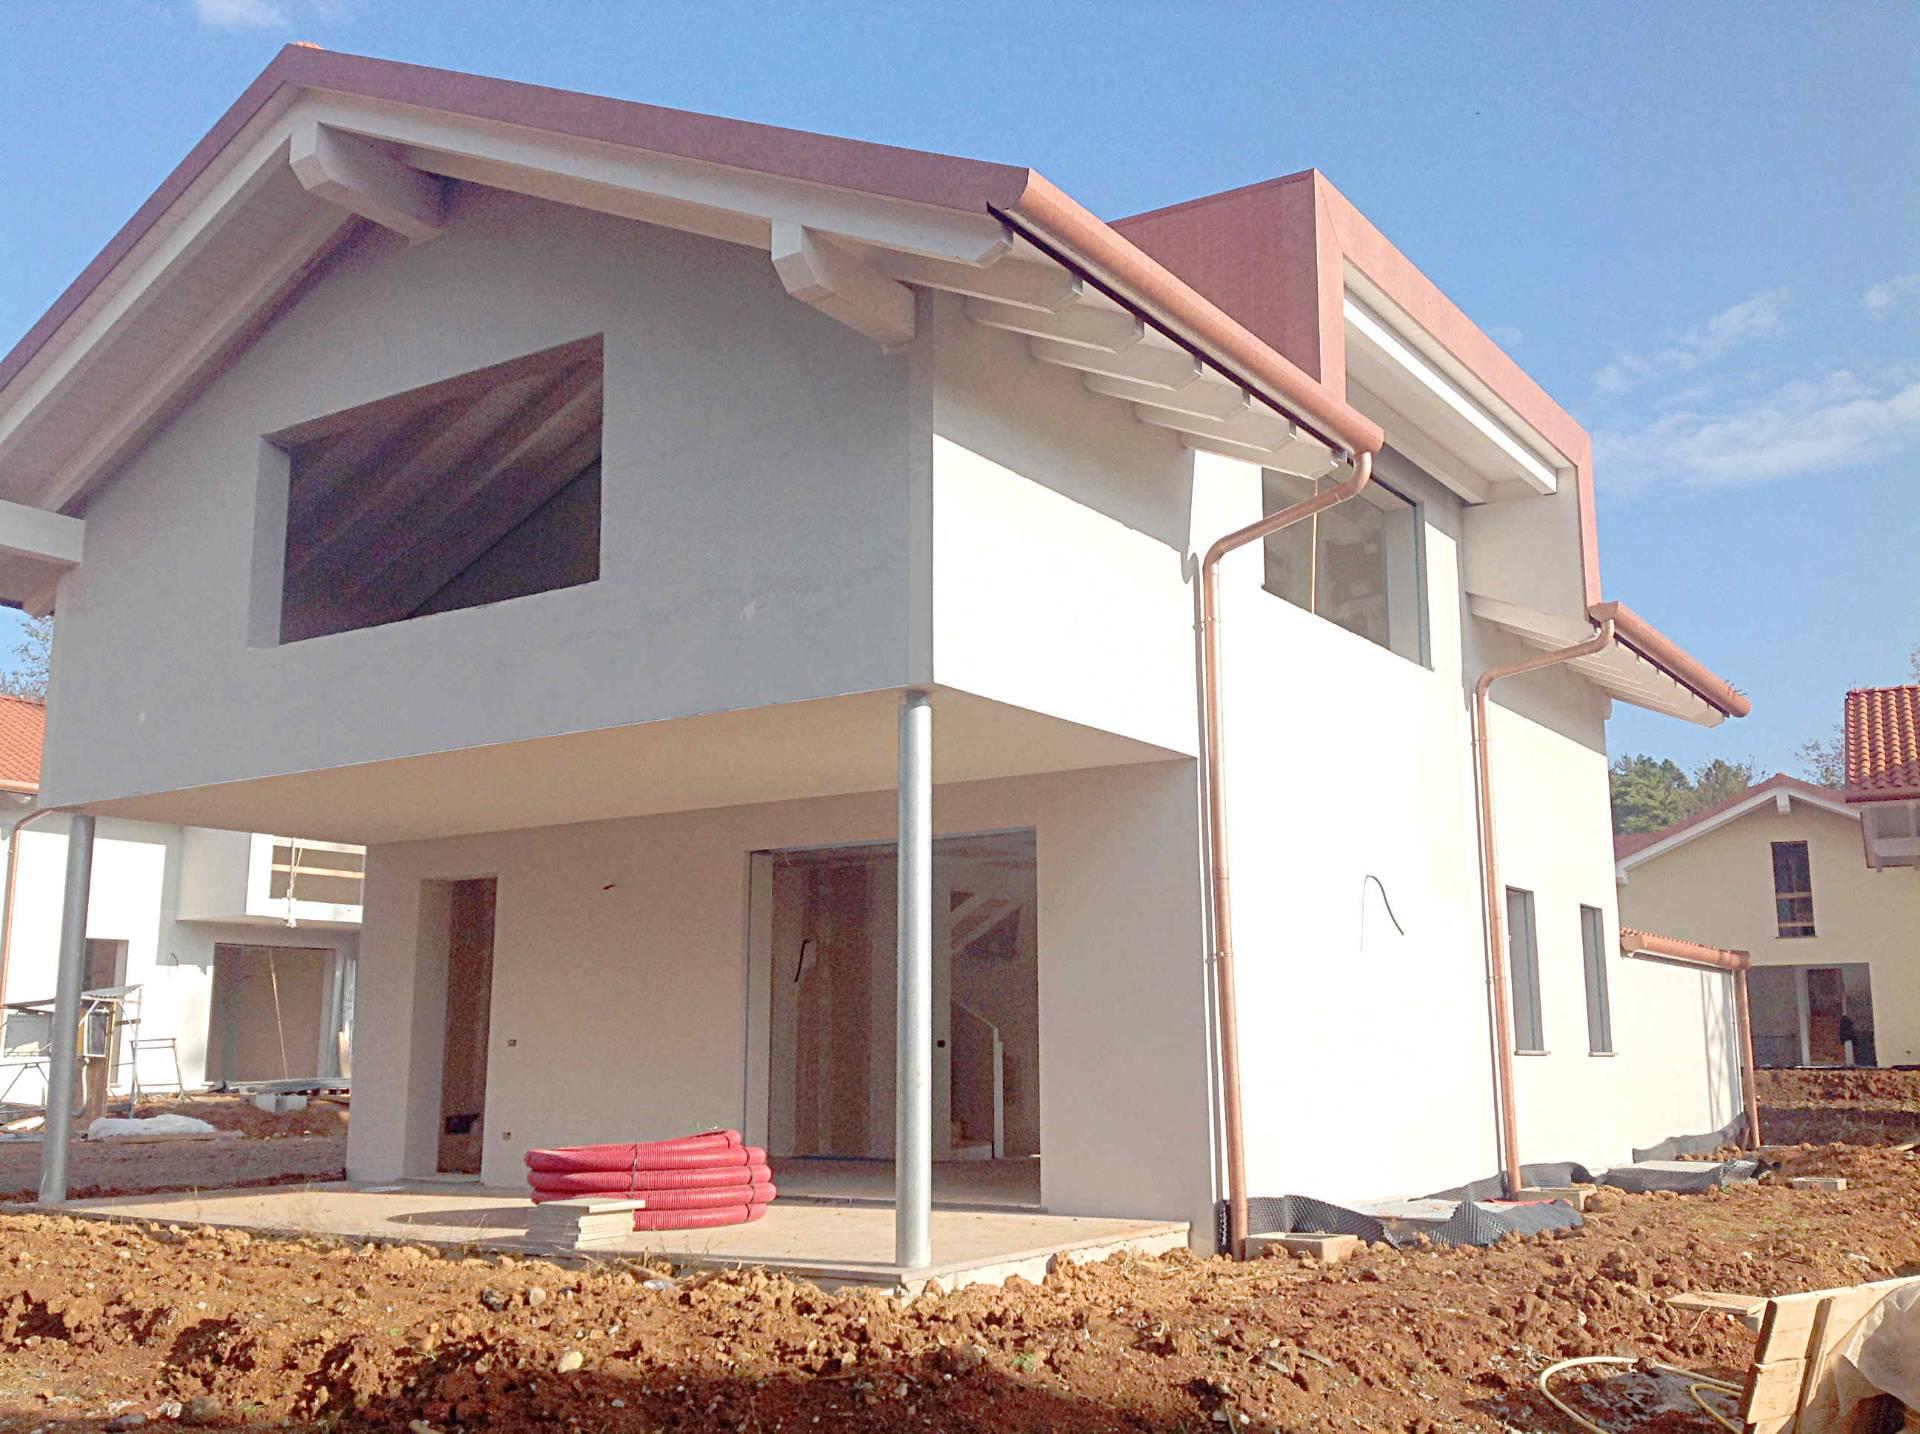 Villa in vendita a Tradate, 4 locali, Trattative riservate | Cambio Casa.it